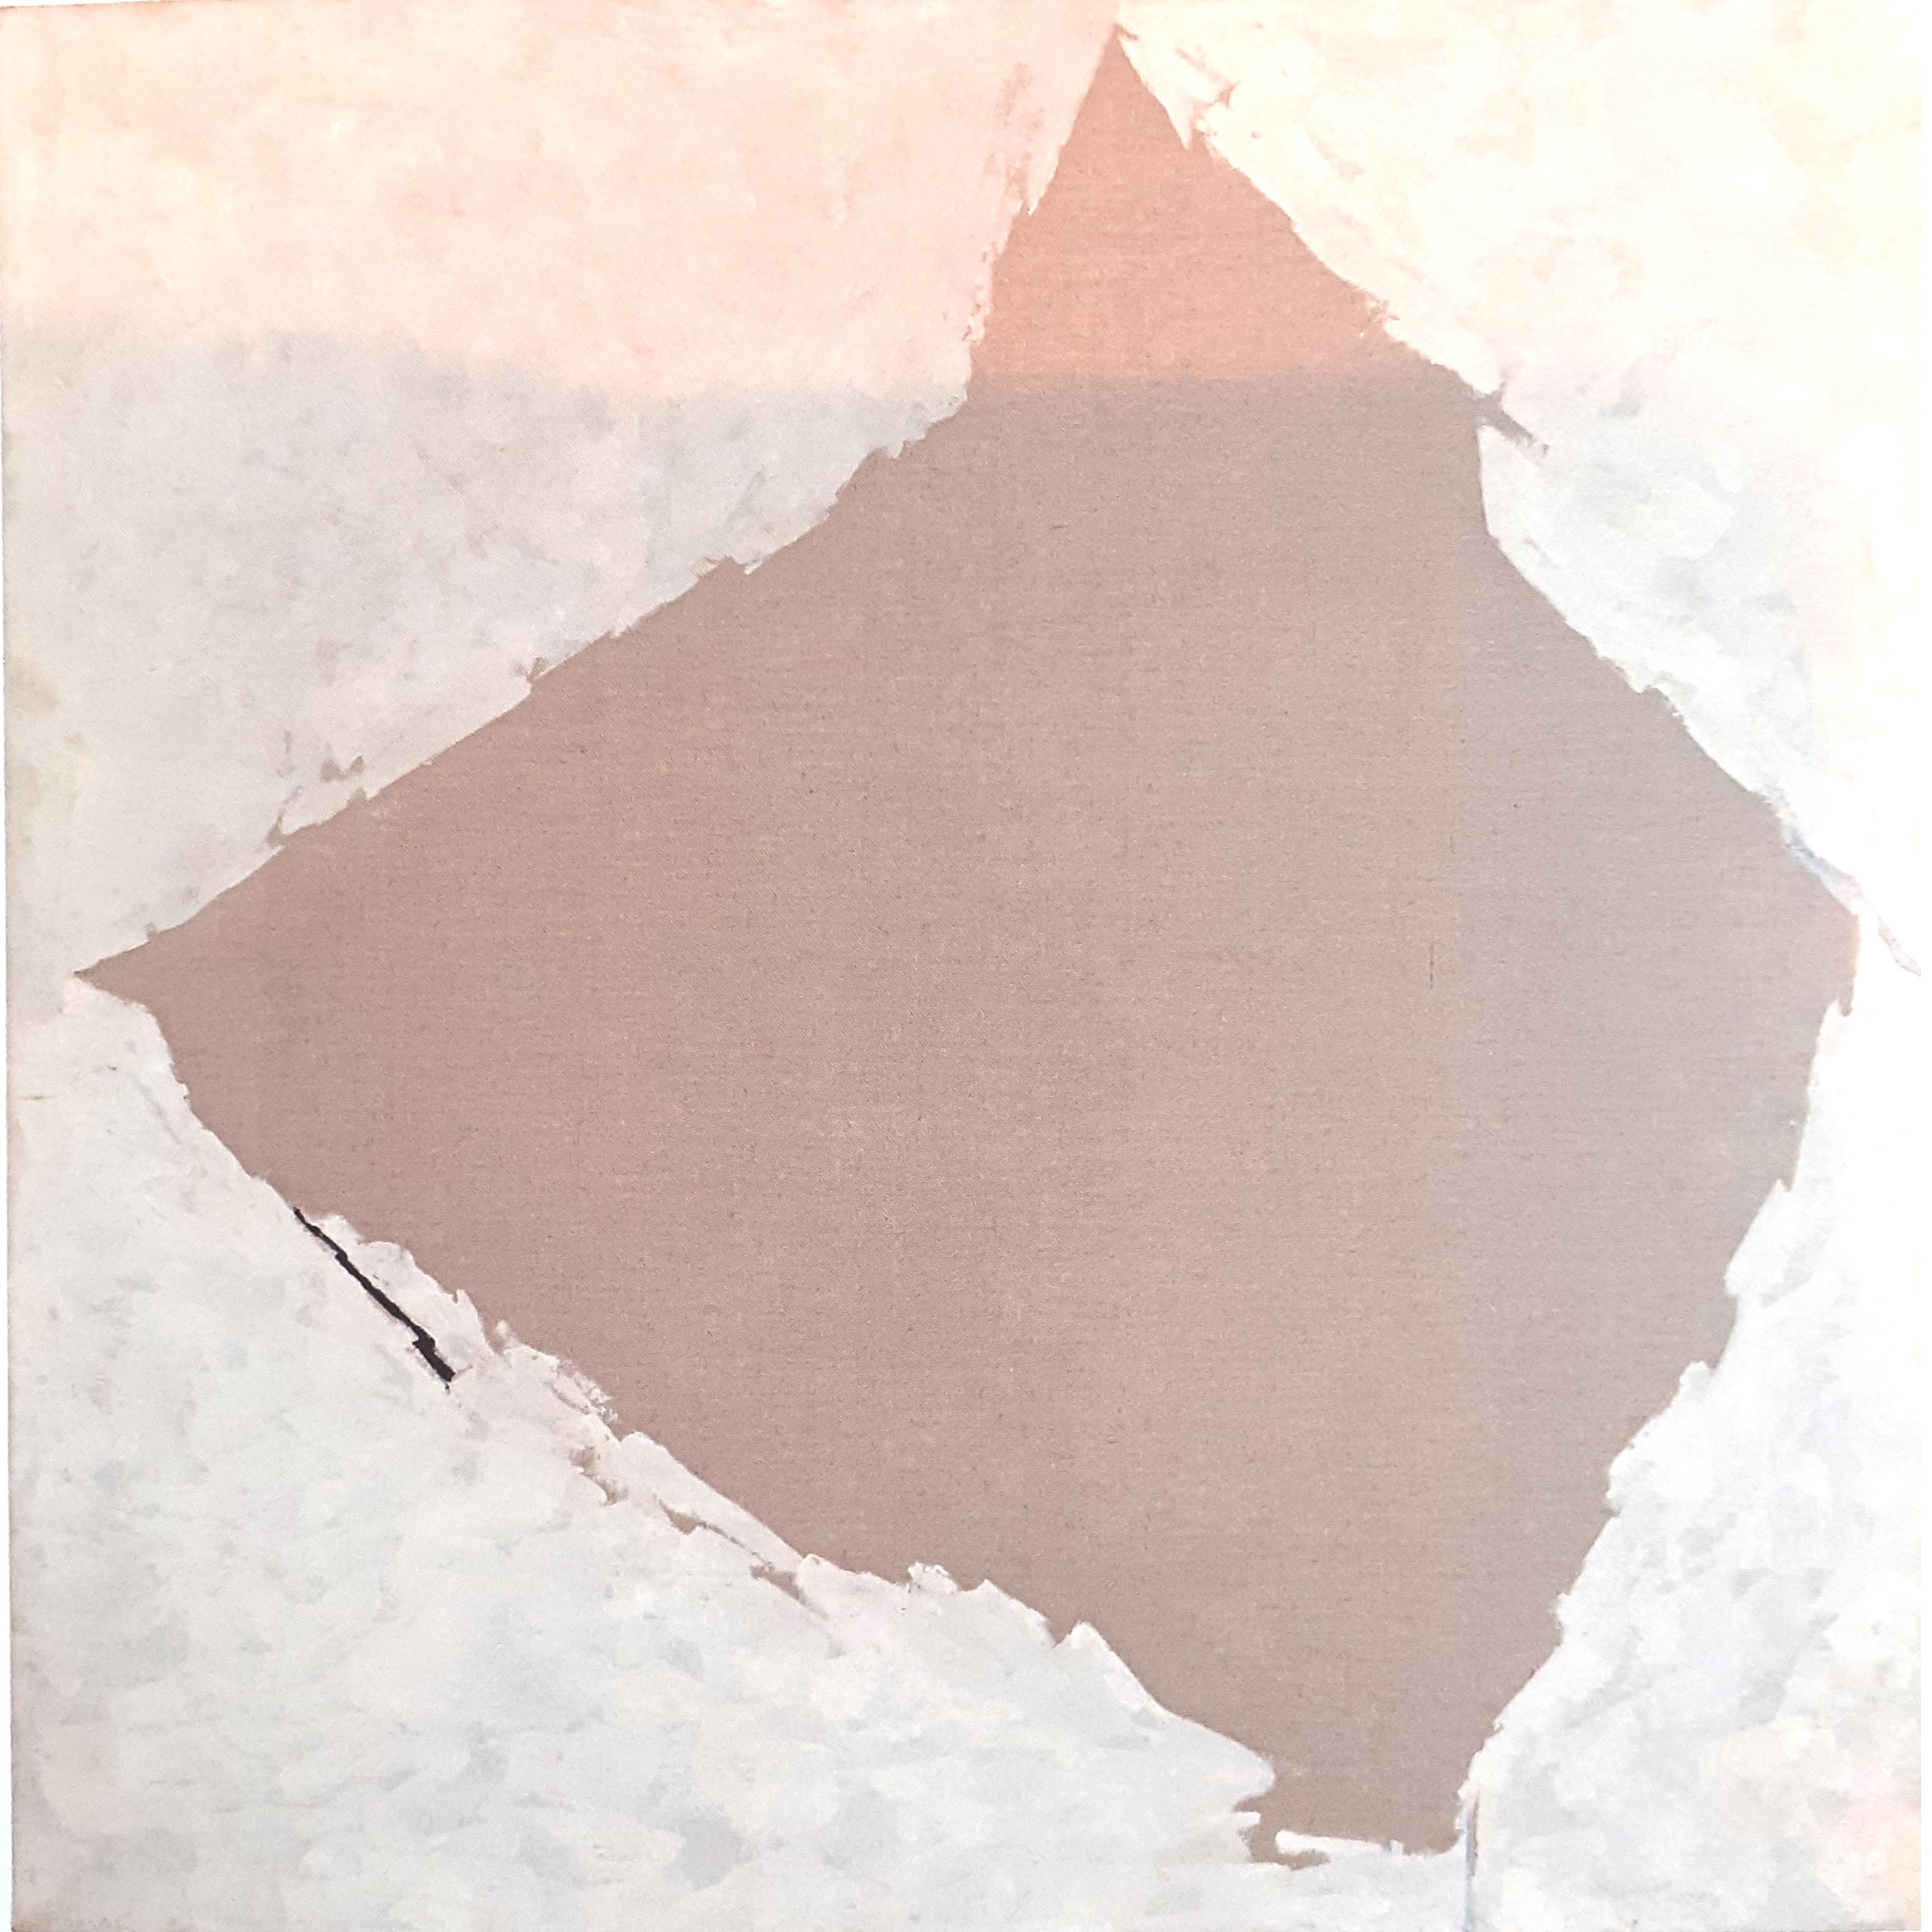 Martin Barré. 59-120x110-C, 1959